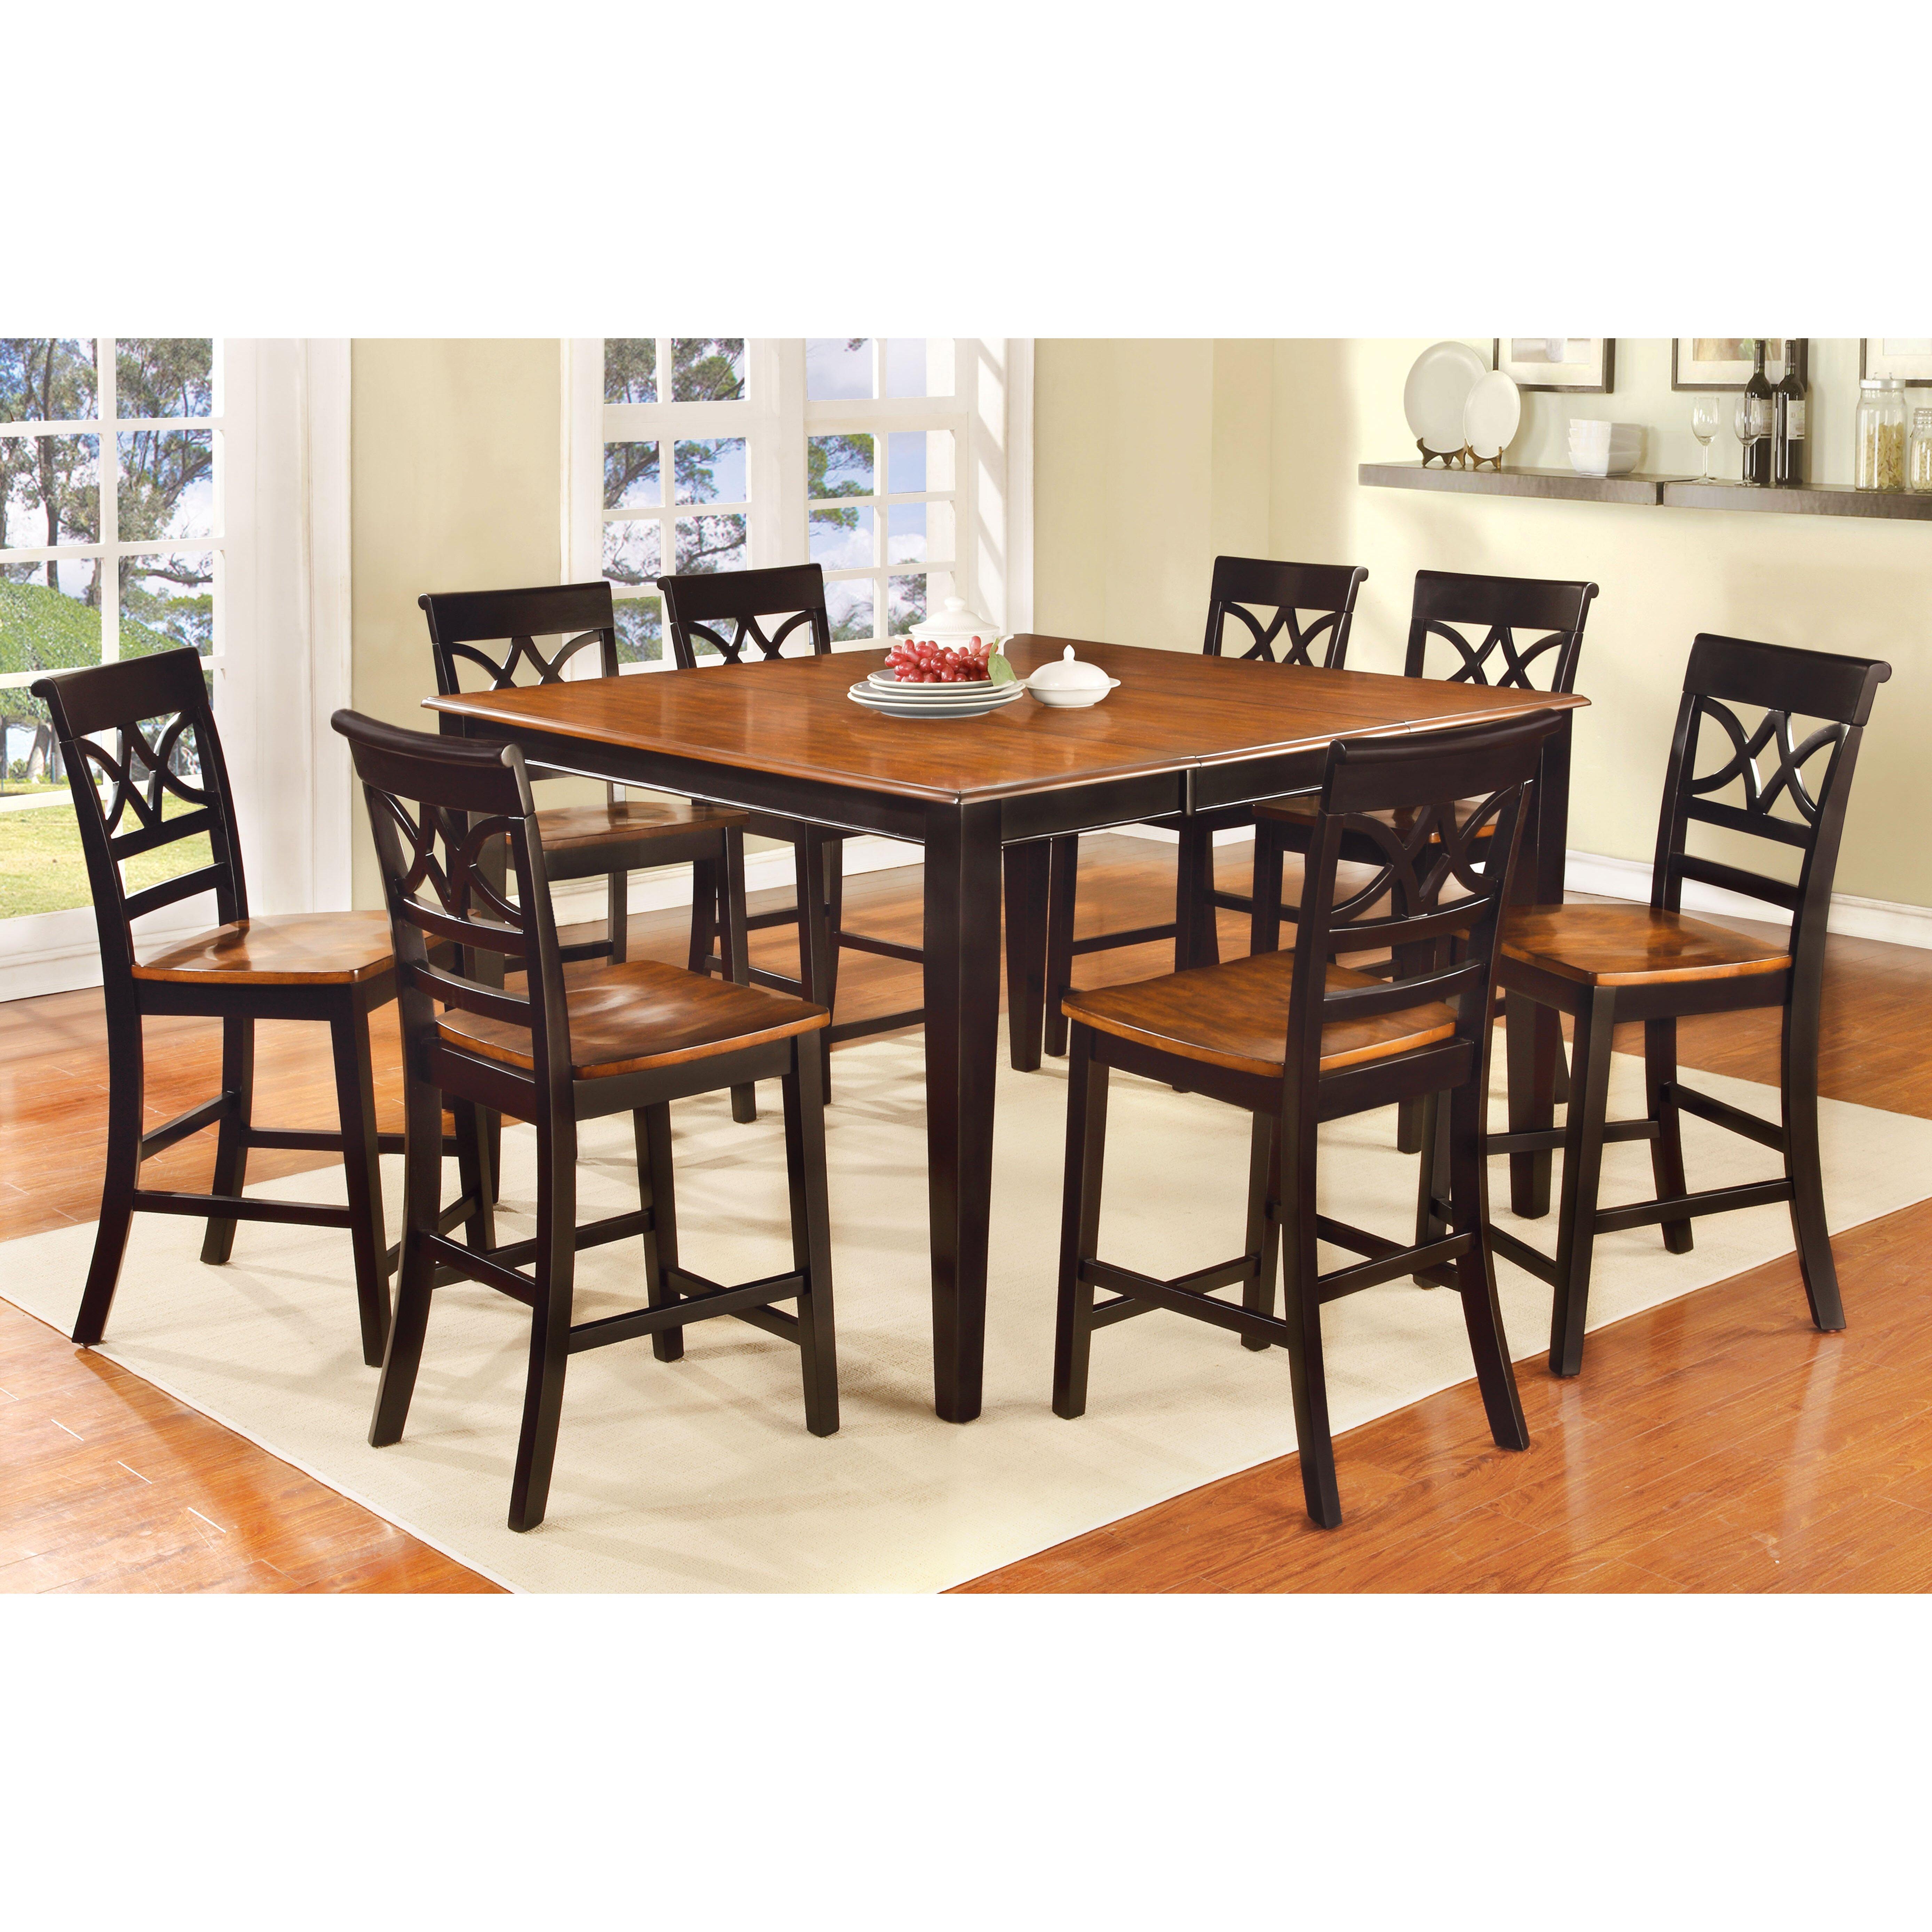 Hokku Designs Exenia 9 Piece Counter Height Pub Dining Set